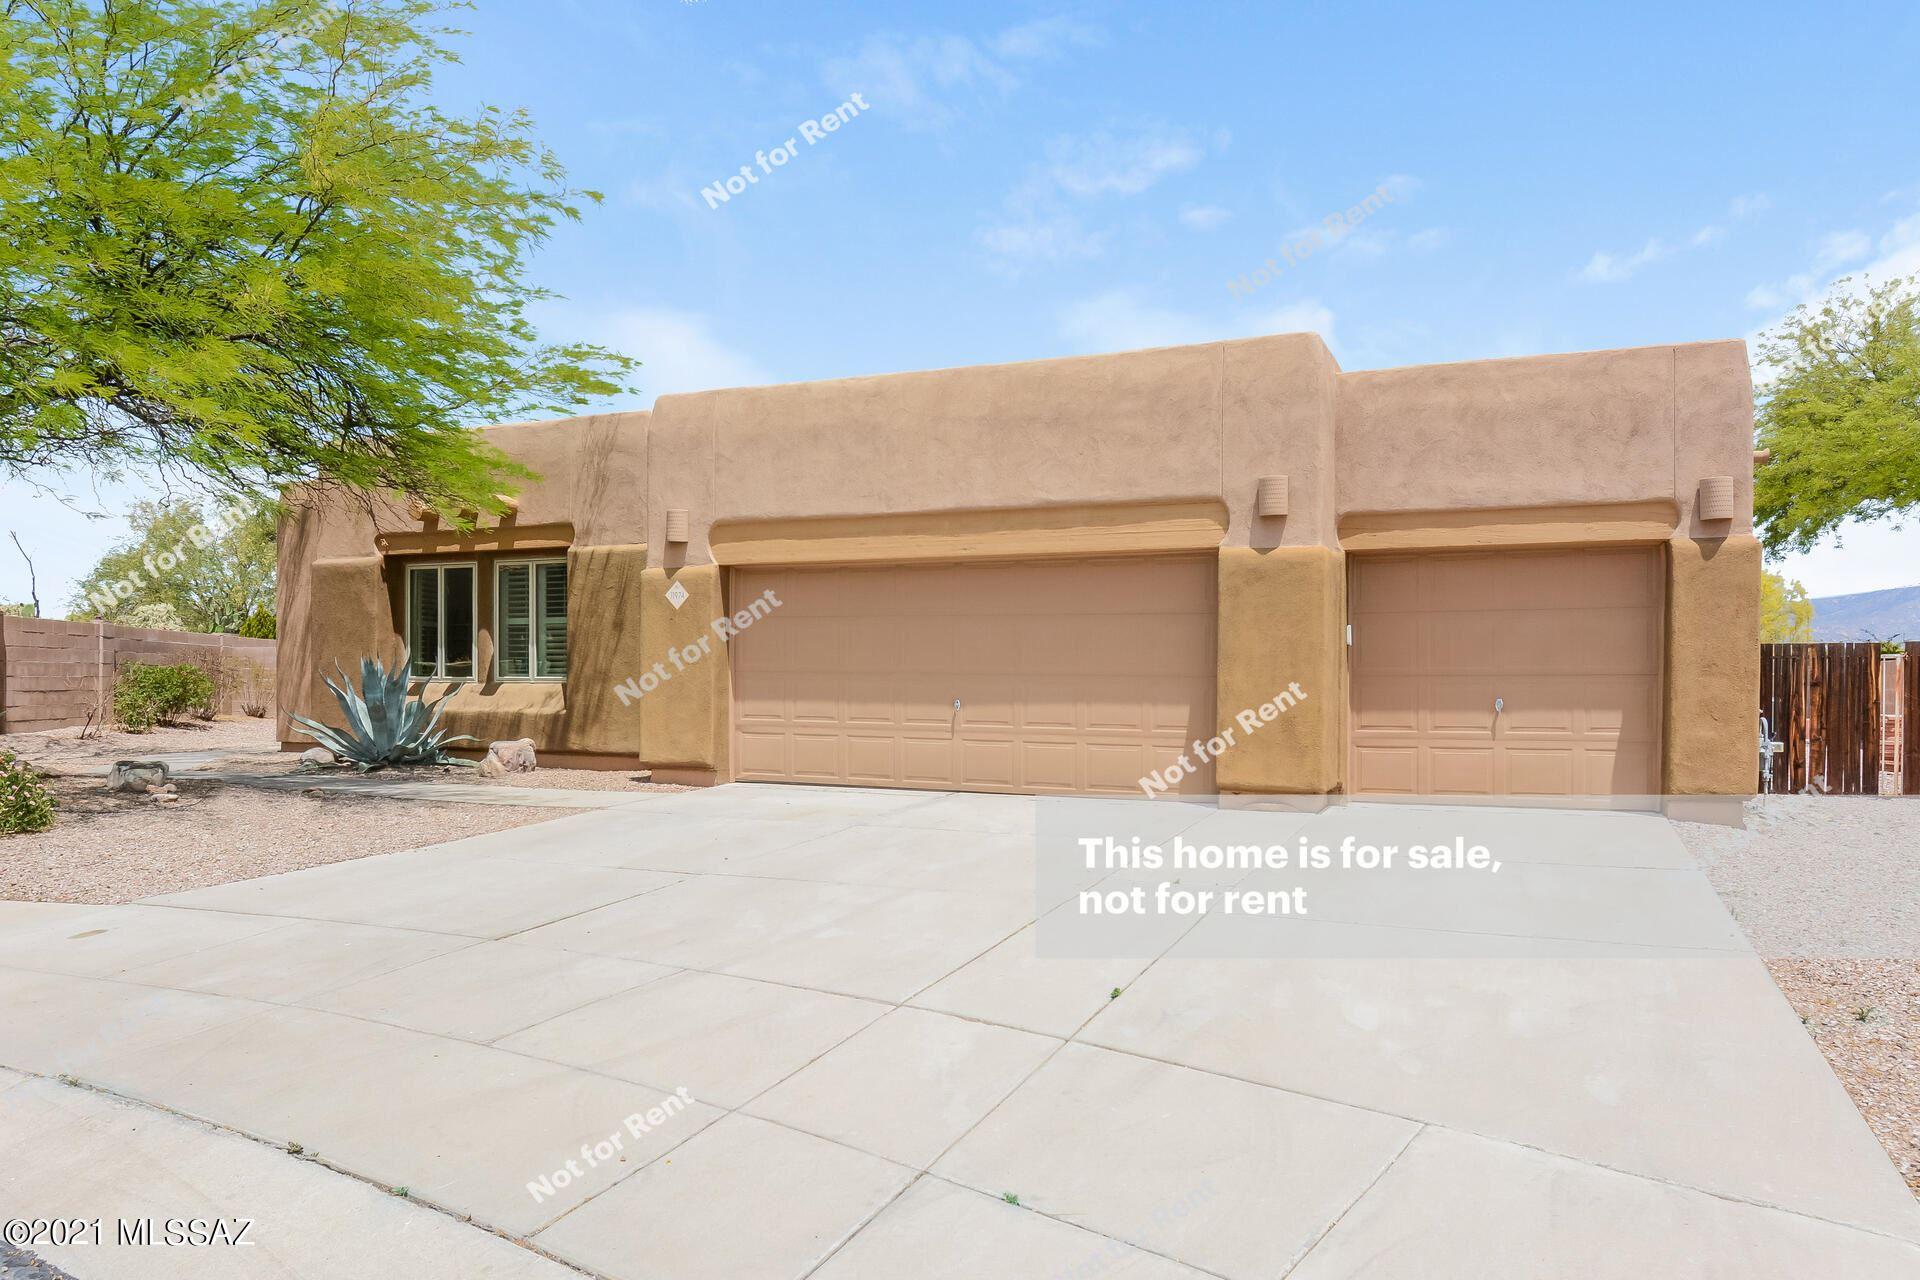 11974 Crescendo Drive, Tucson, AZ 85737 - MLS#: 22111754